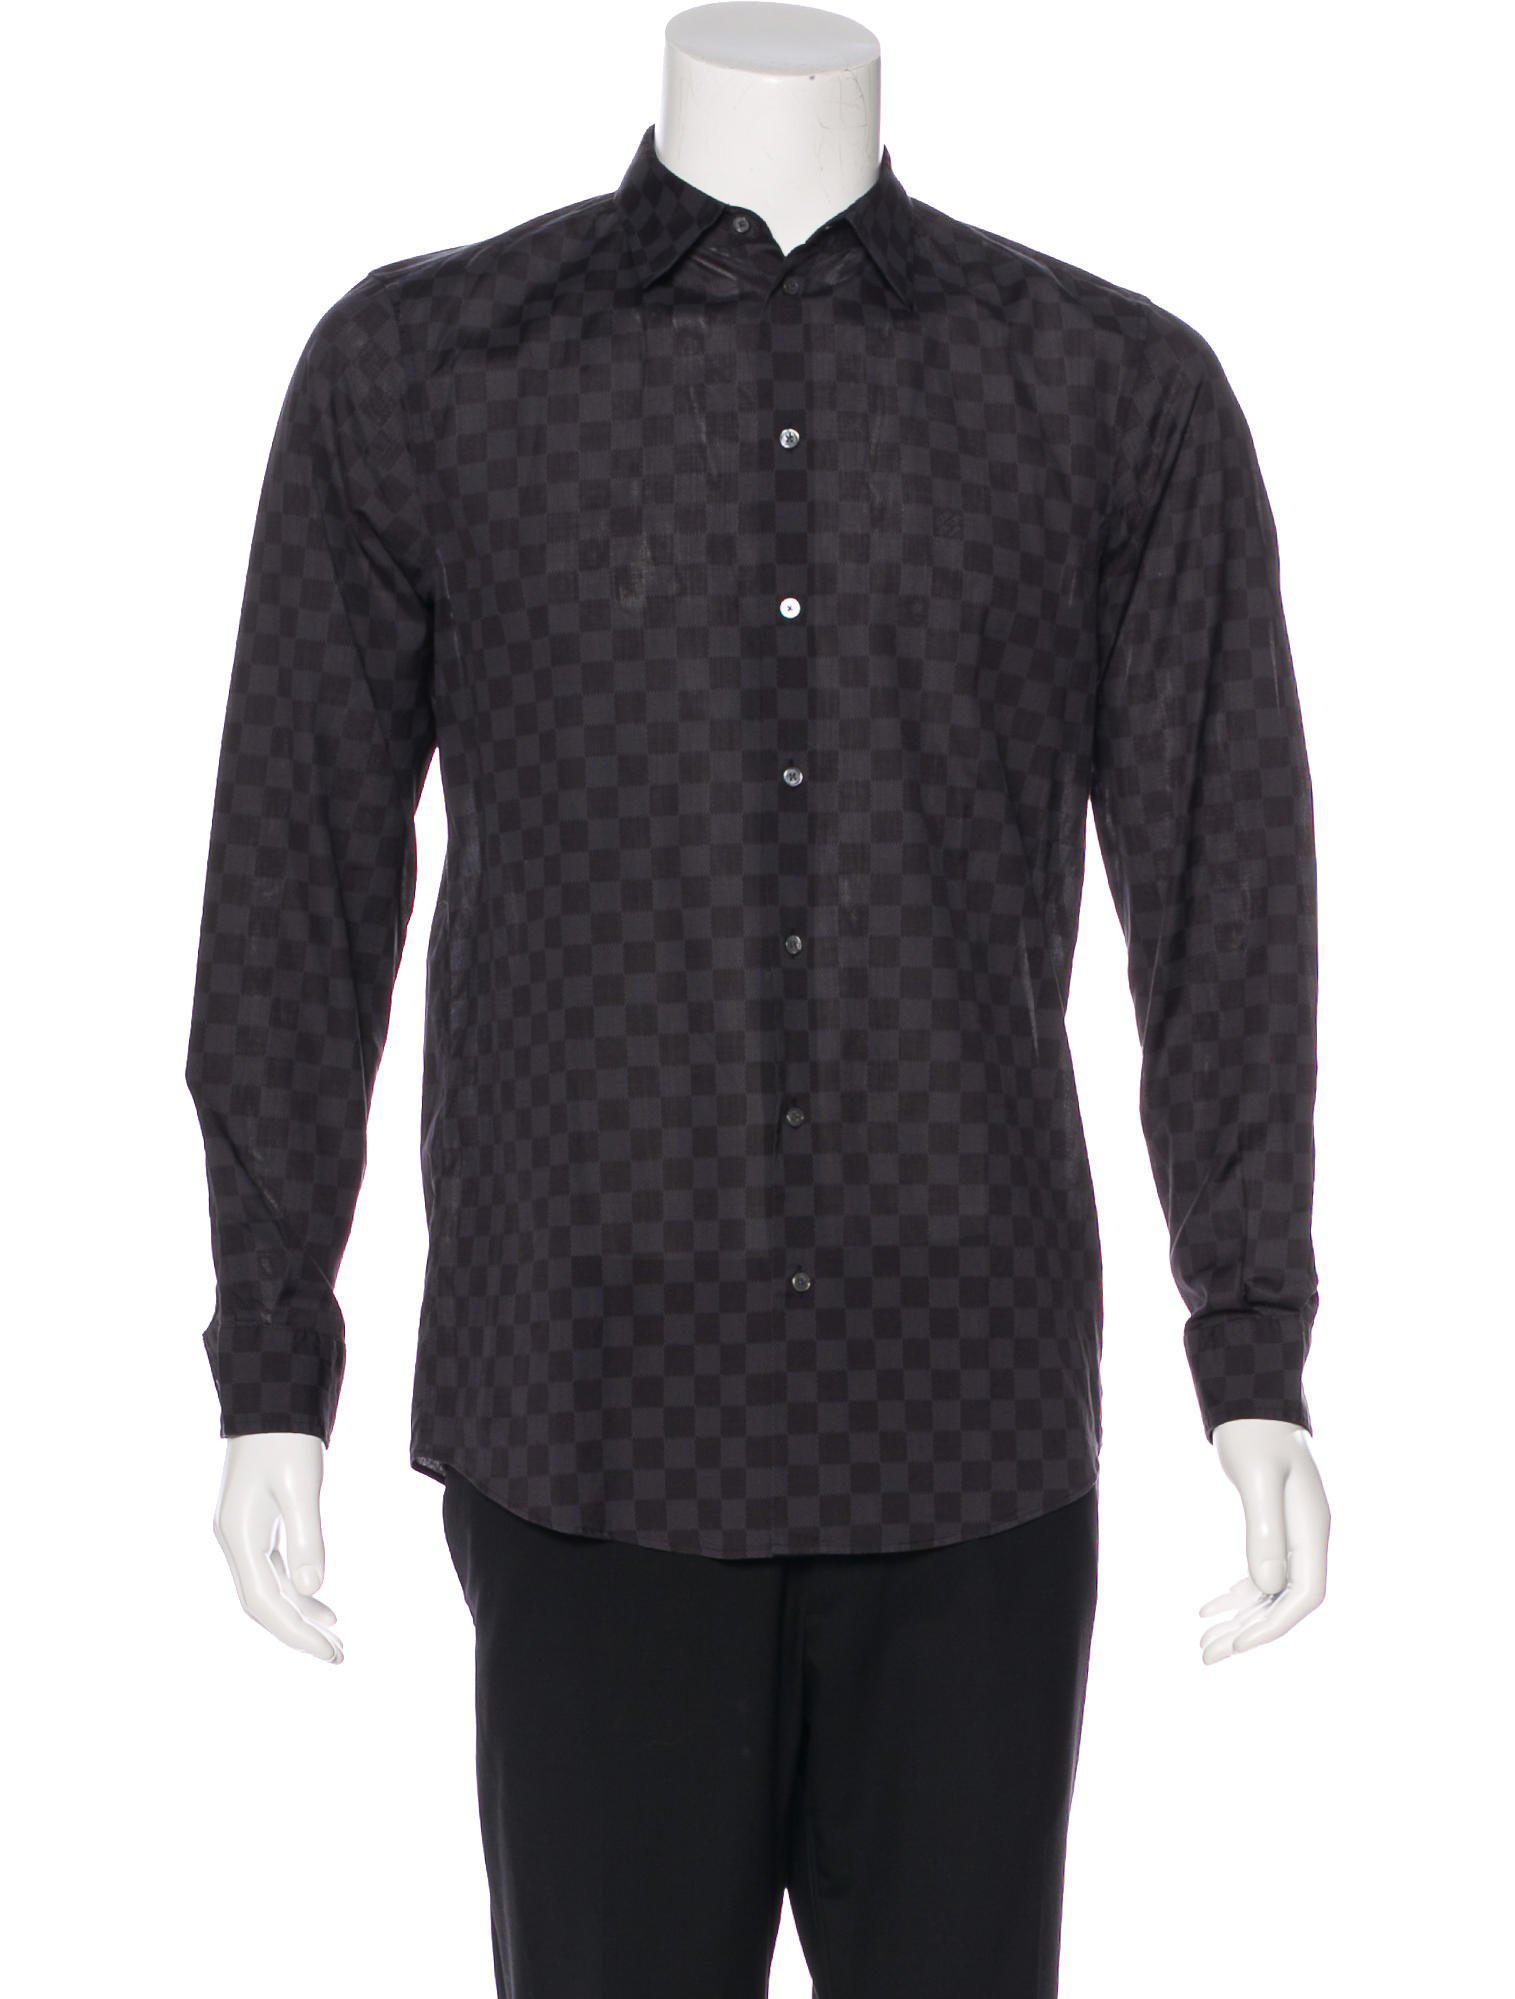 Lyst Louis Vuitton Damier Graphite Button Up Shirt Grey In Gray